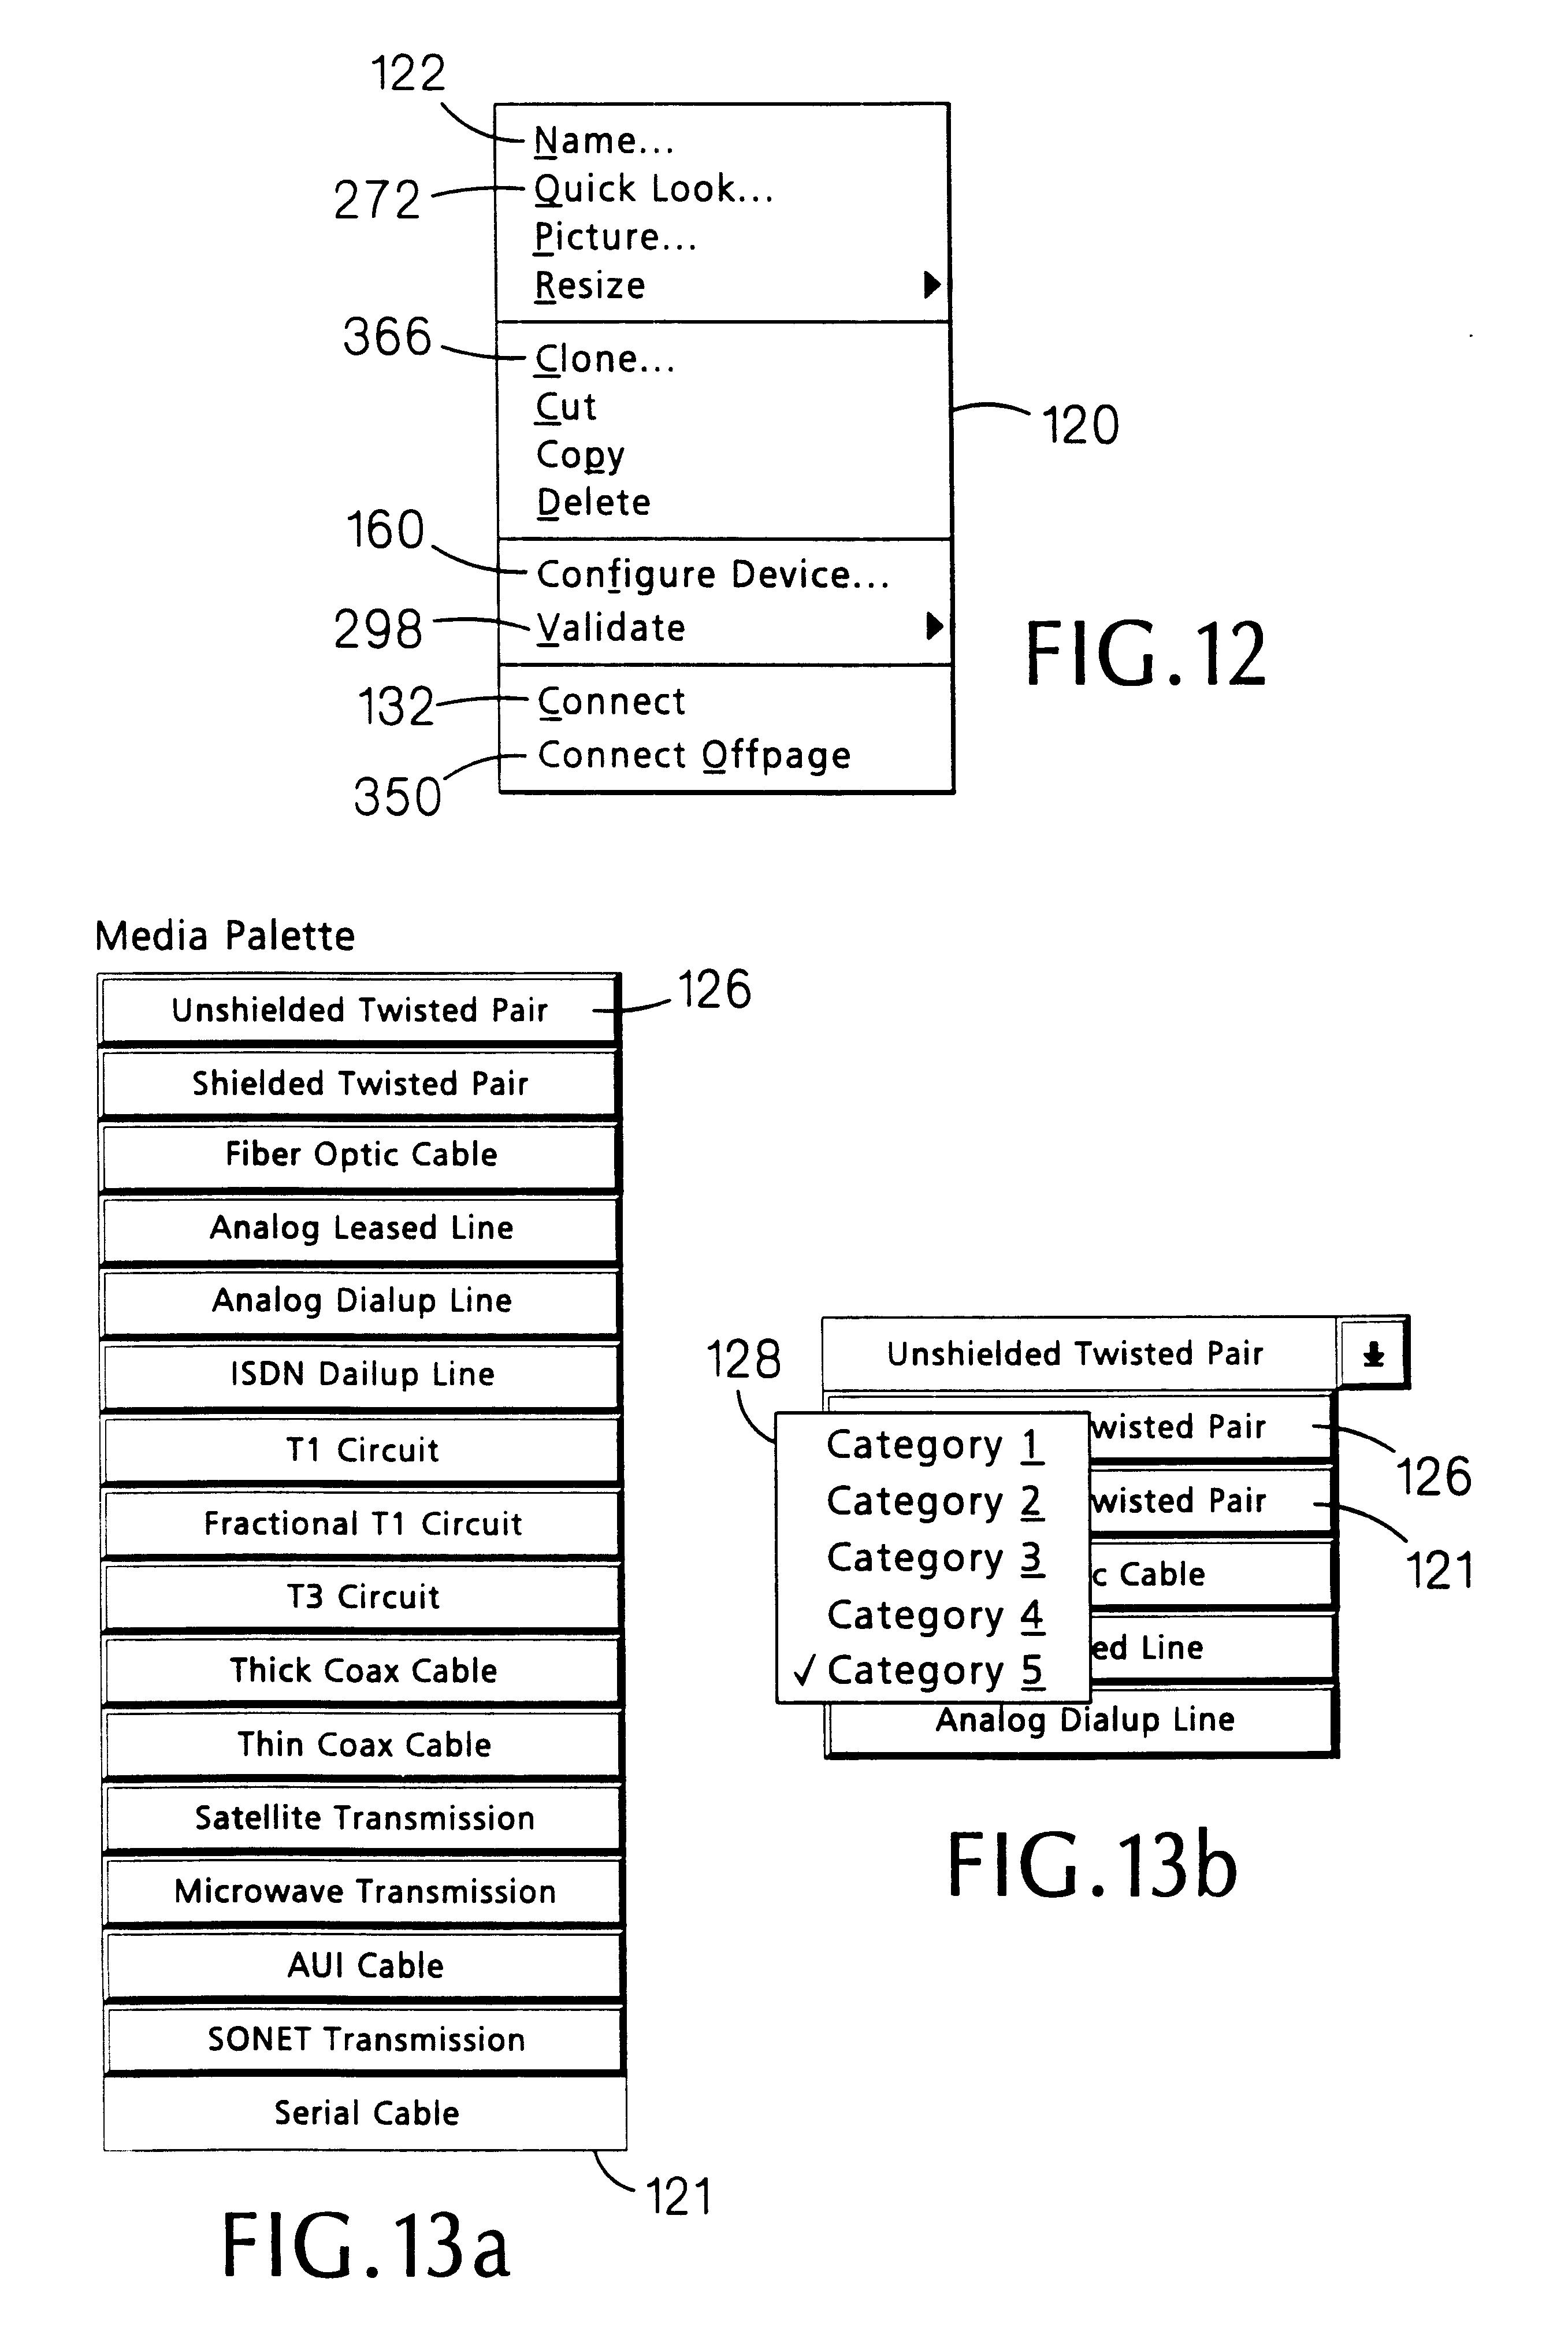 Patent US 6,229,540 B1